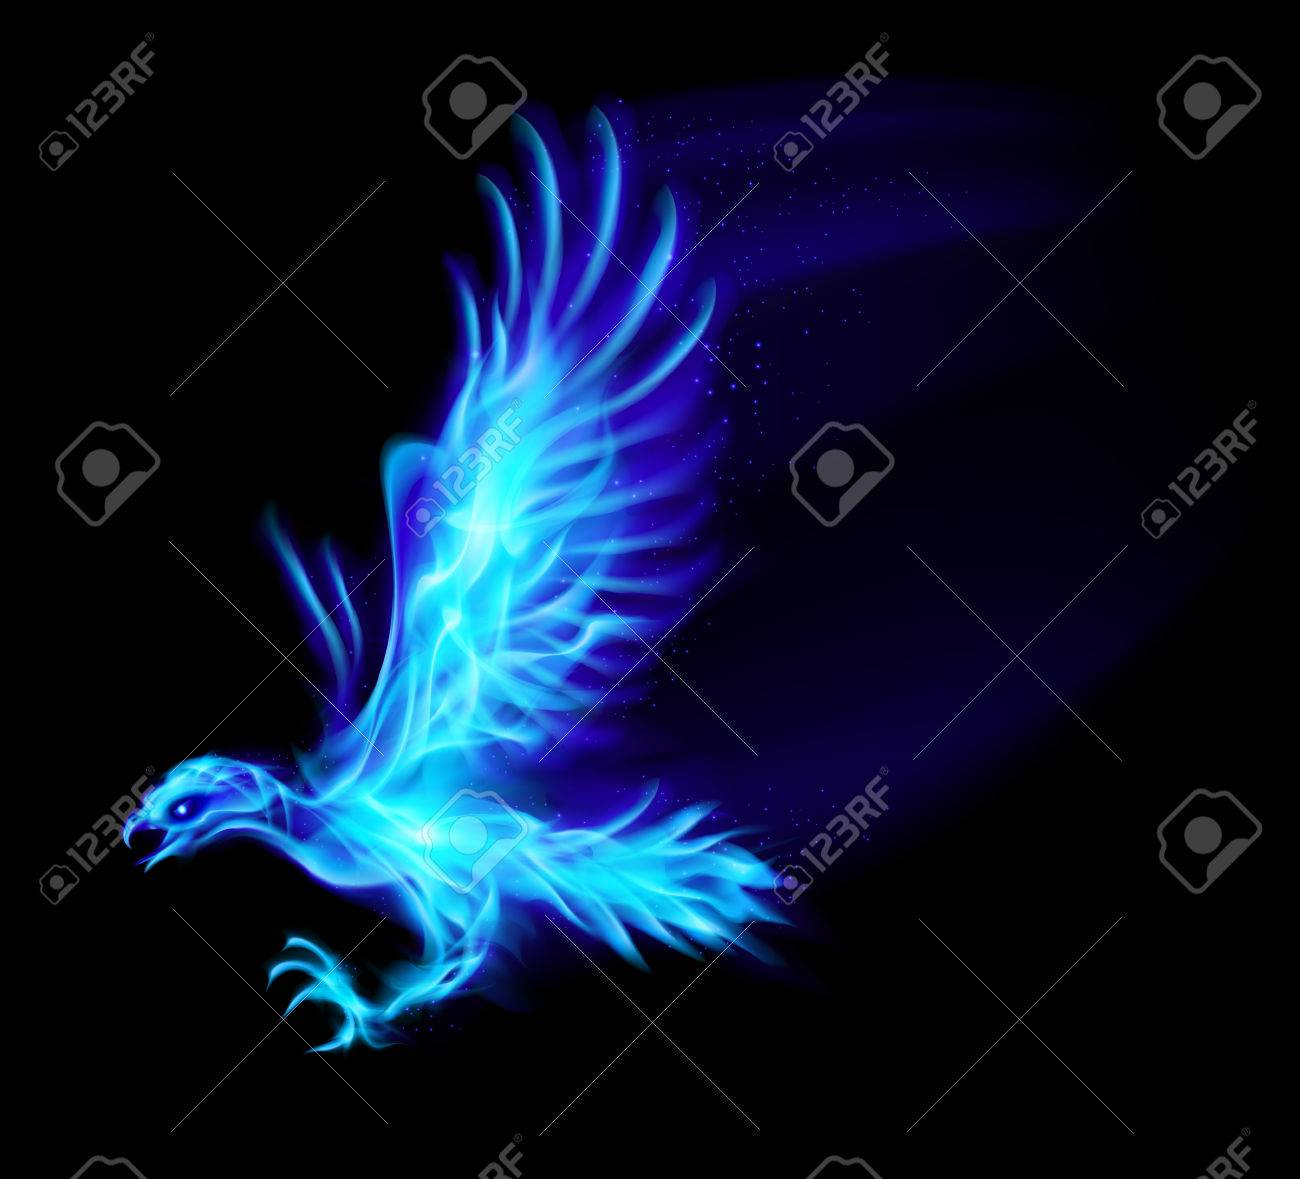 Illustration of blue fire hawk on black background. Stock Vector - 22910044